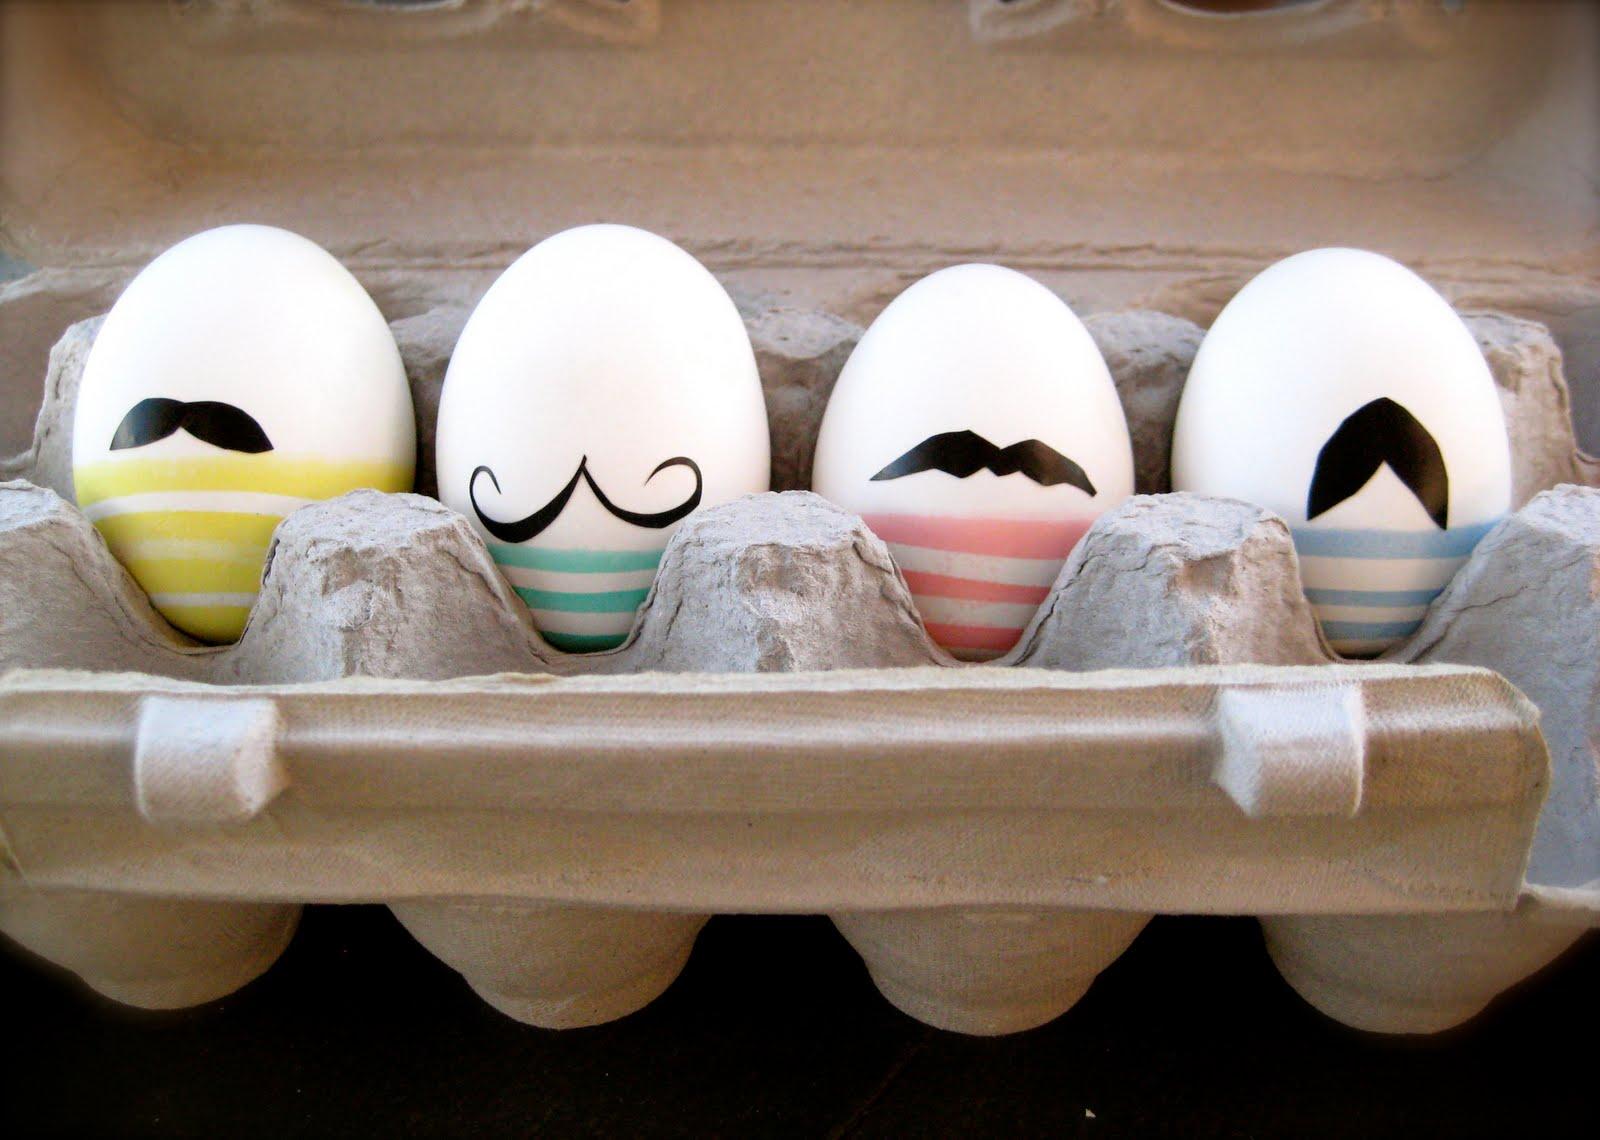 Segreto Secrets - Easter Egg Decorating and Dyeing Ideas